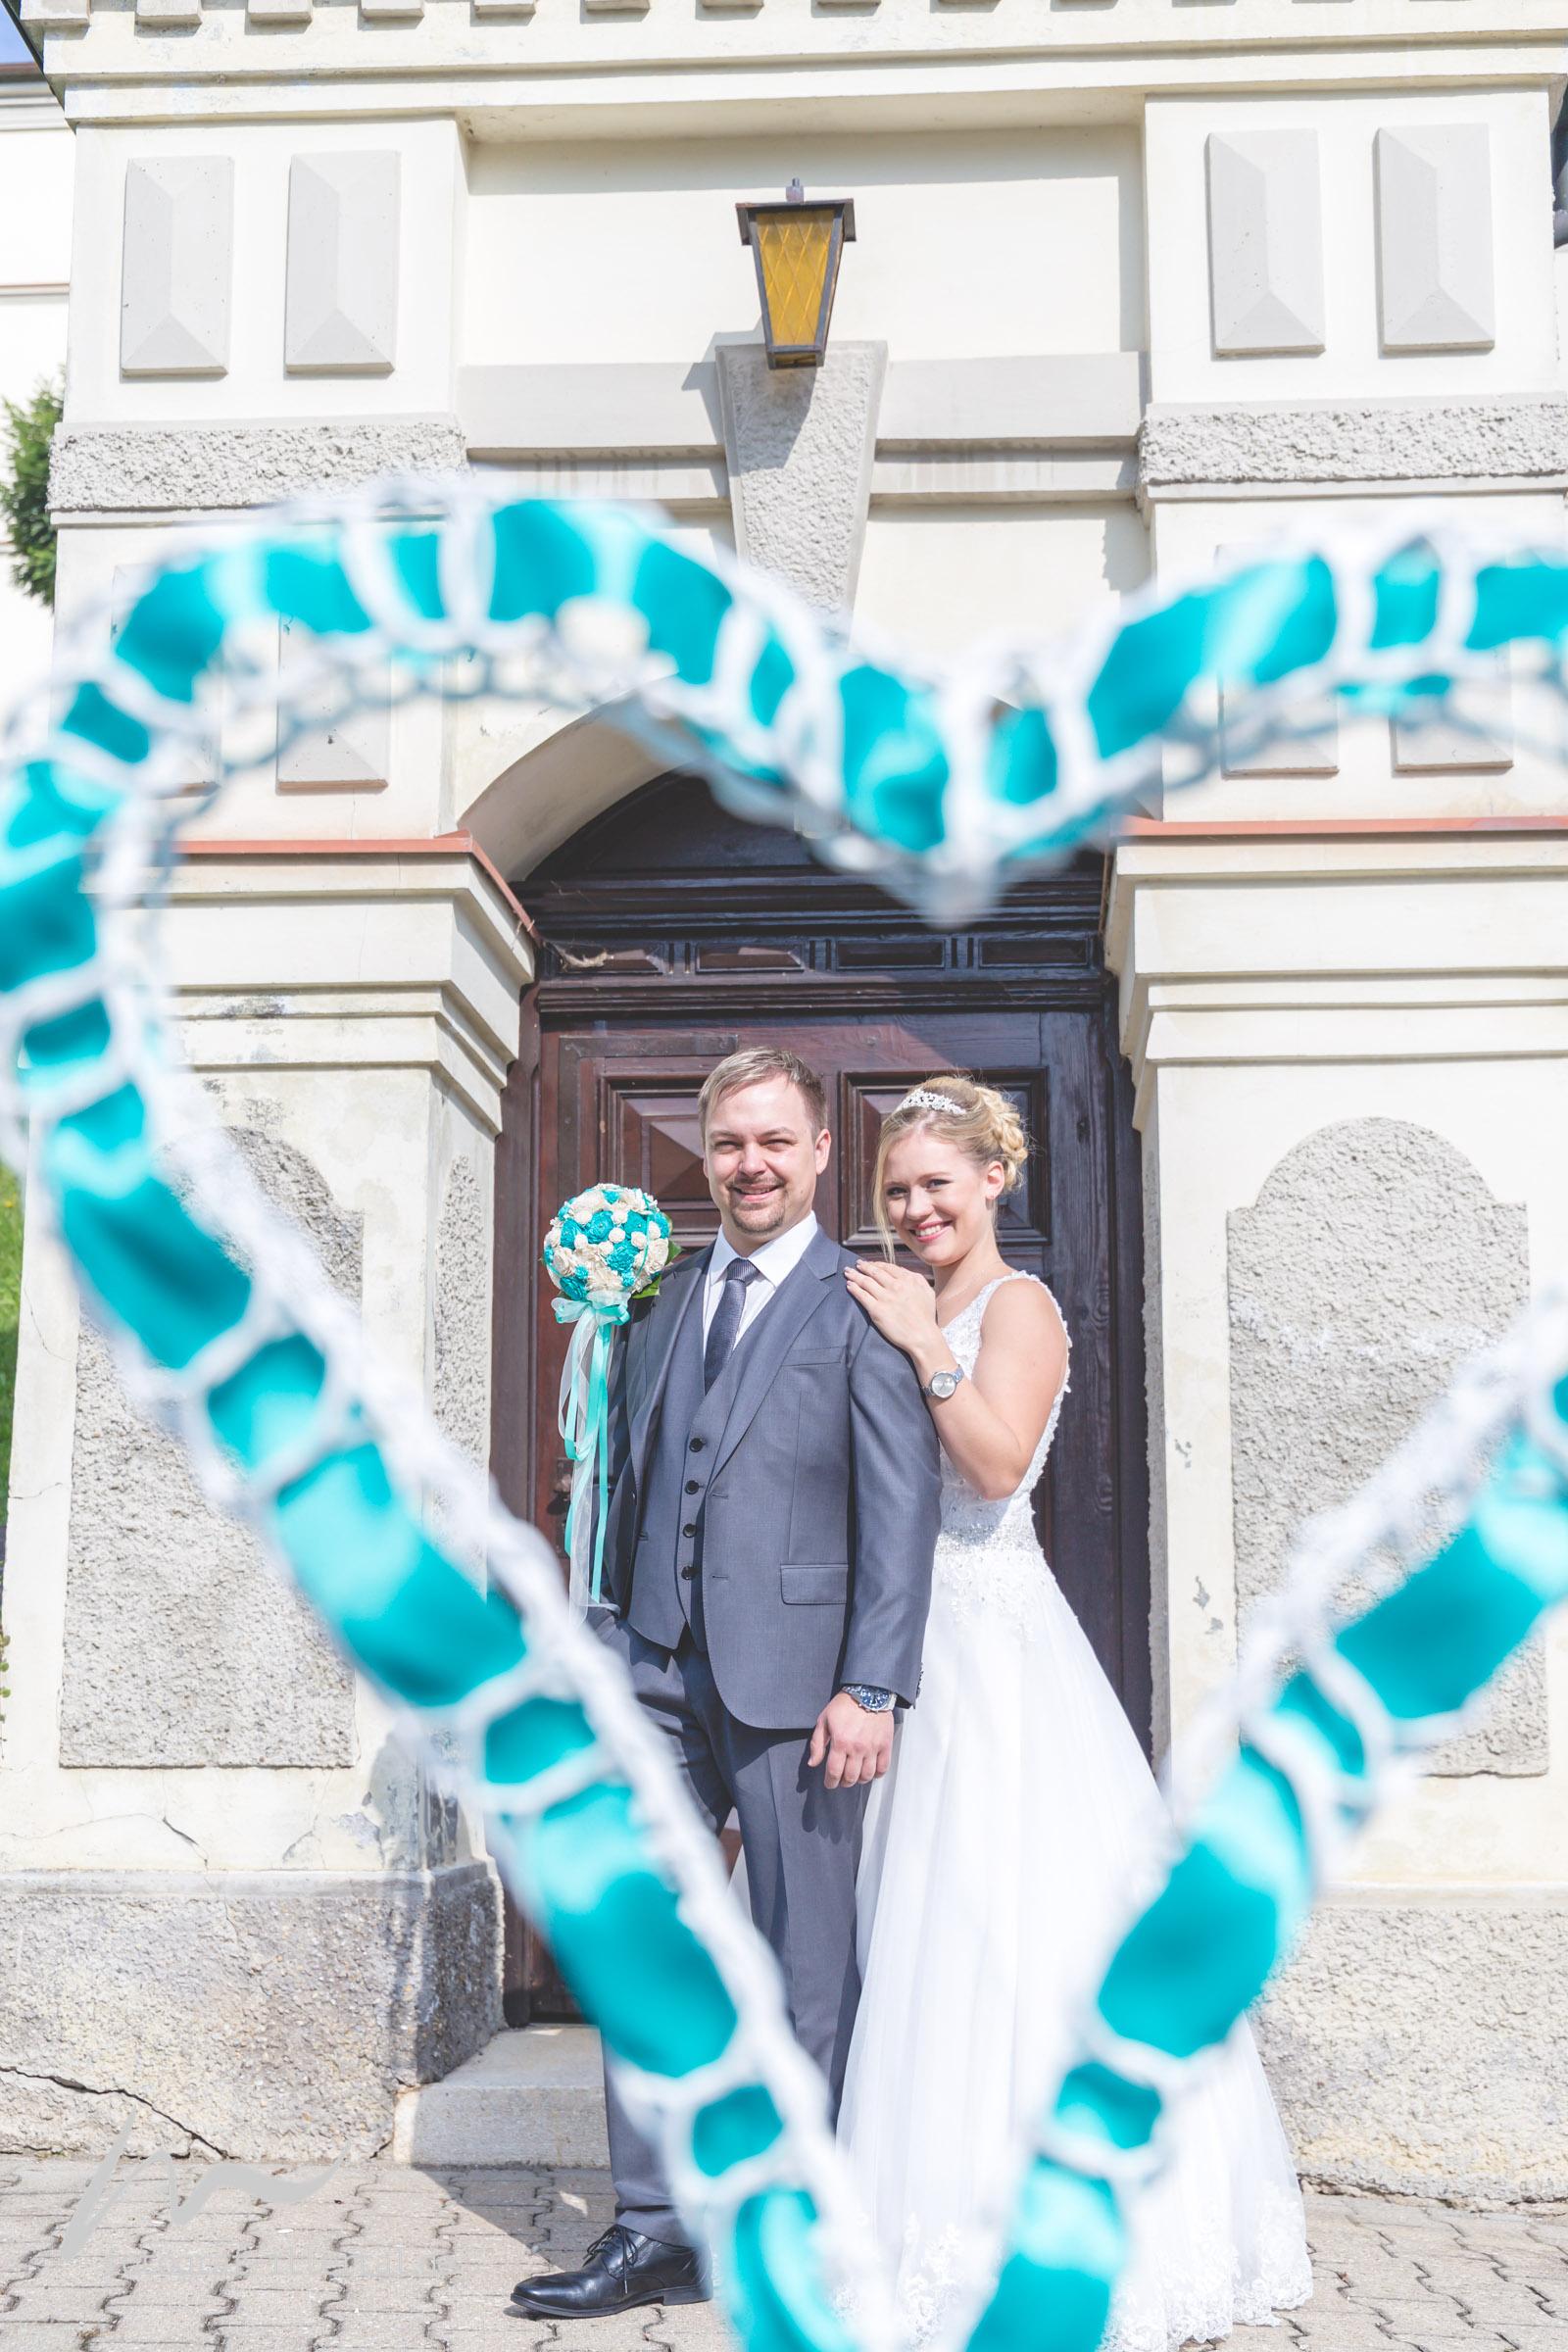 Fotograf Illertal-Christian Miller-Hochzeitsfotografie-_MG_8005